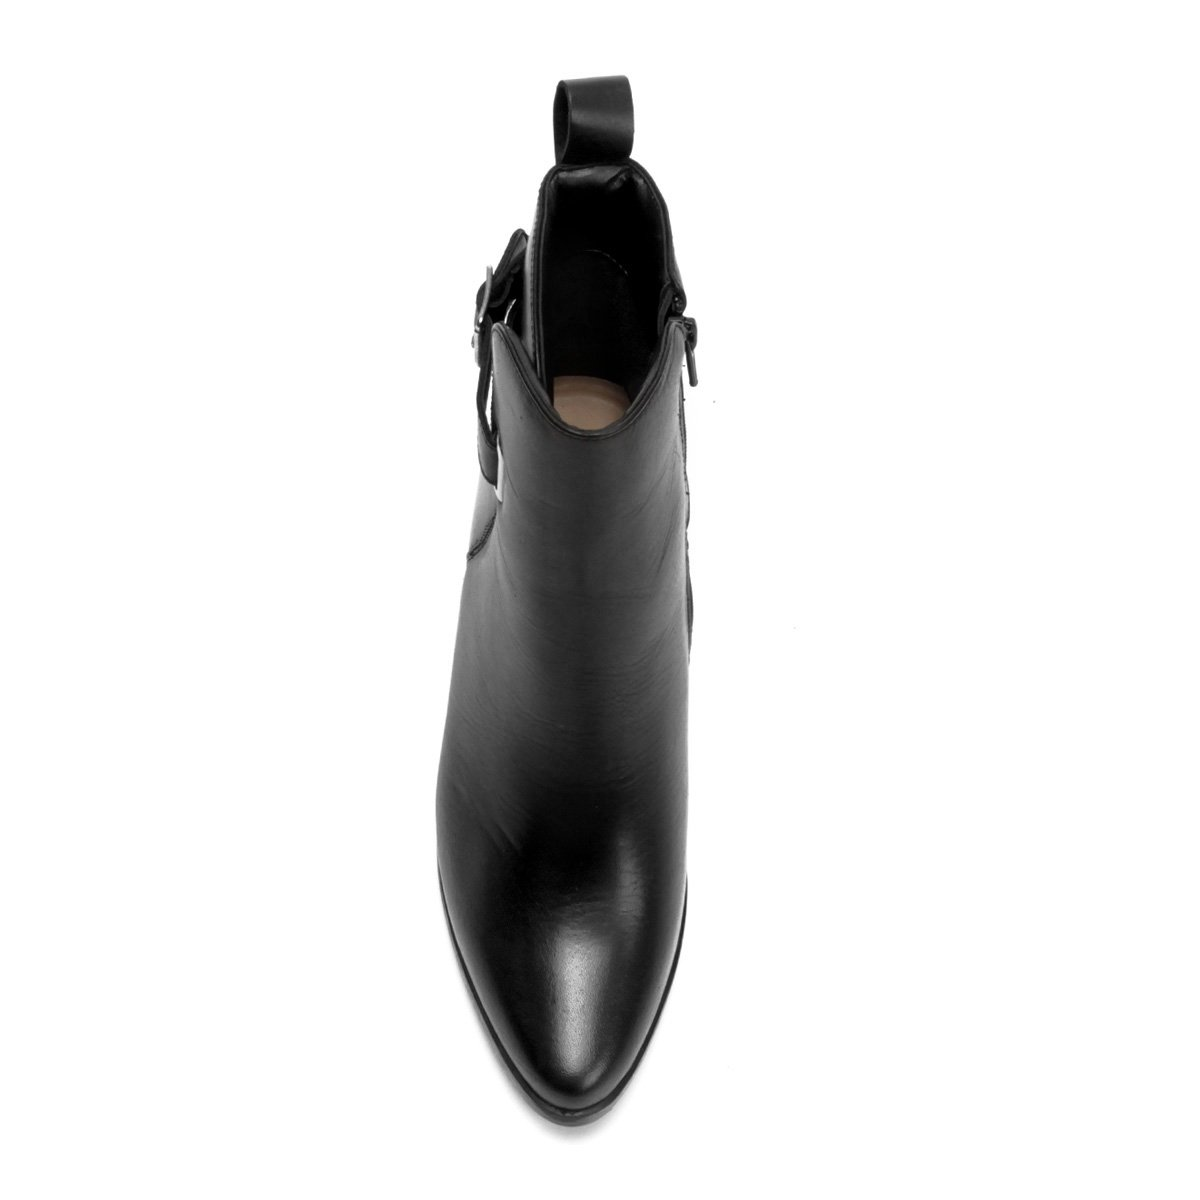 Feminina Bota Curto Couro Salto Bota Couro Preto Shoestock Cano Alto 8qUZqxF